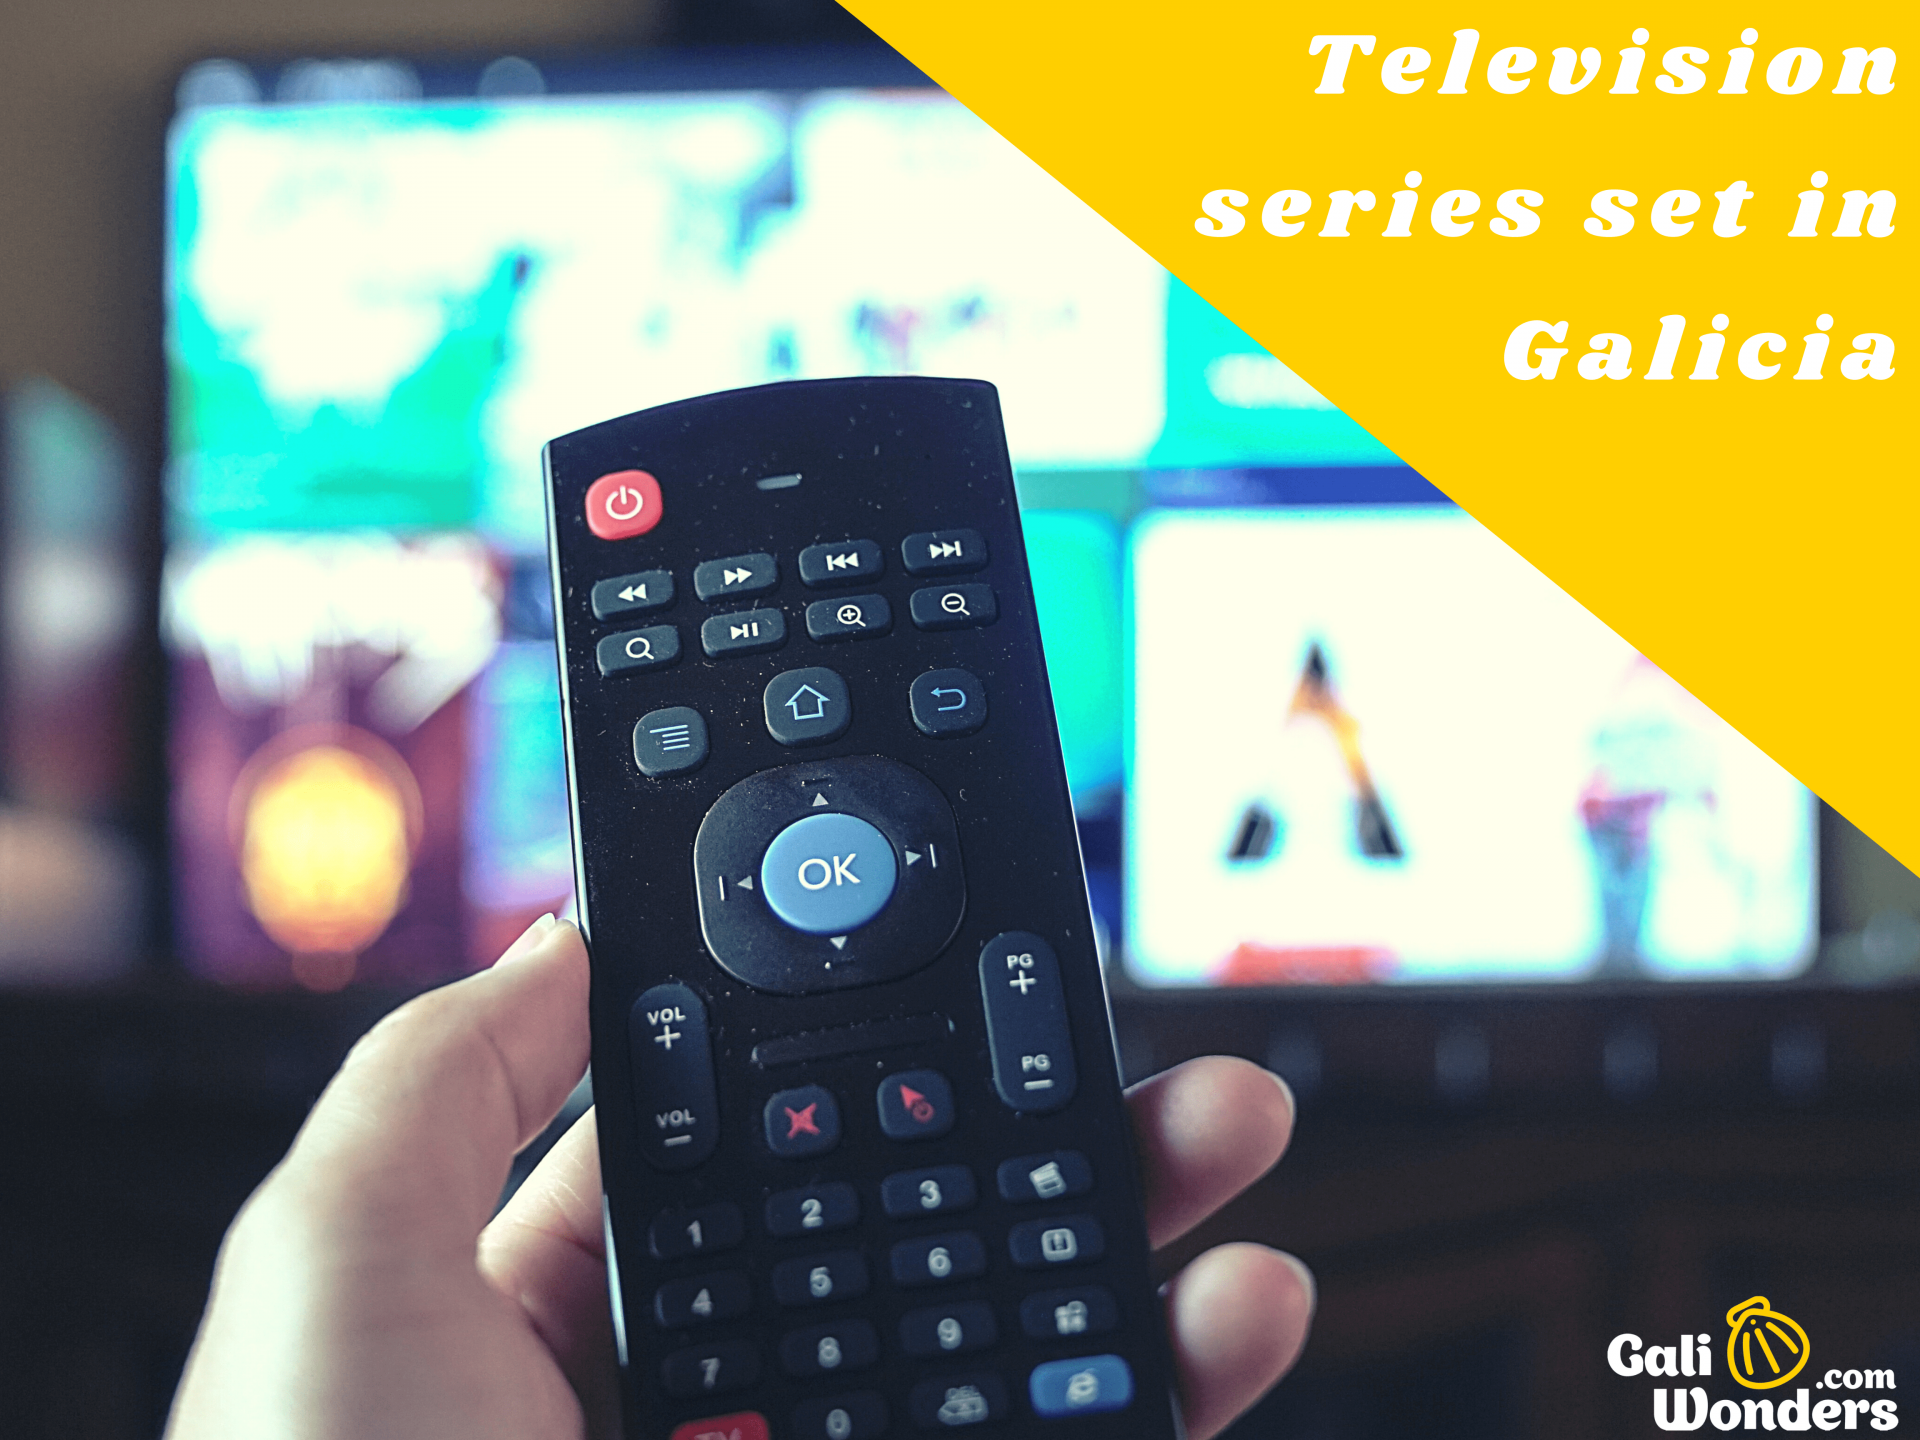 TV Series set in galicia